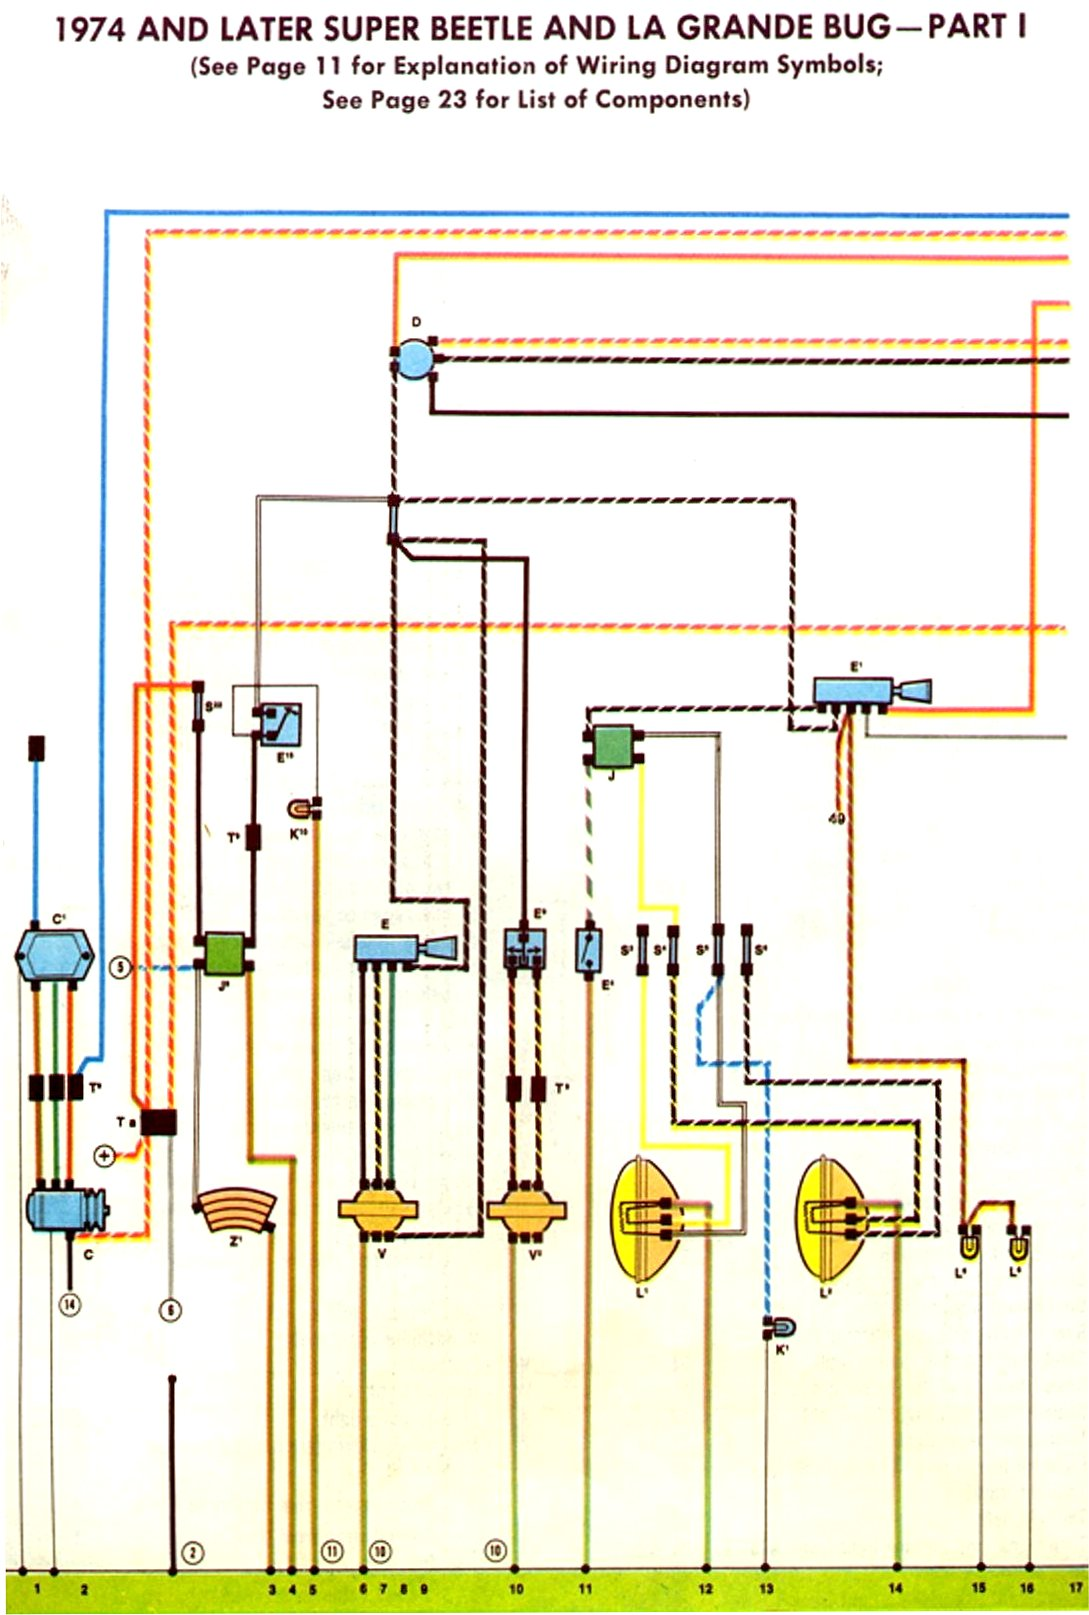 1974 75 Super Beetle Wiring Diagram TheGoldenBug Com